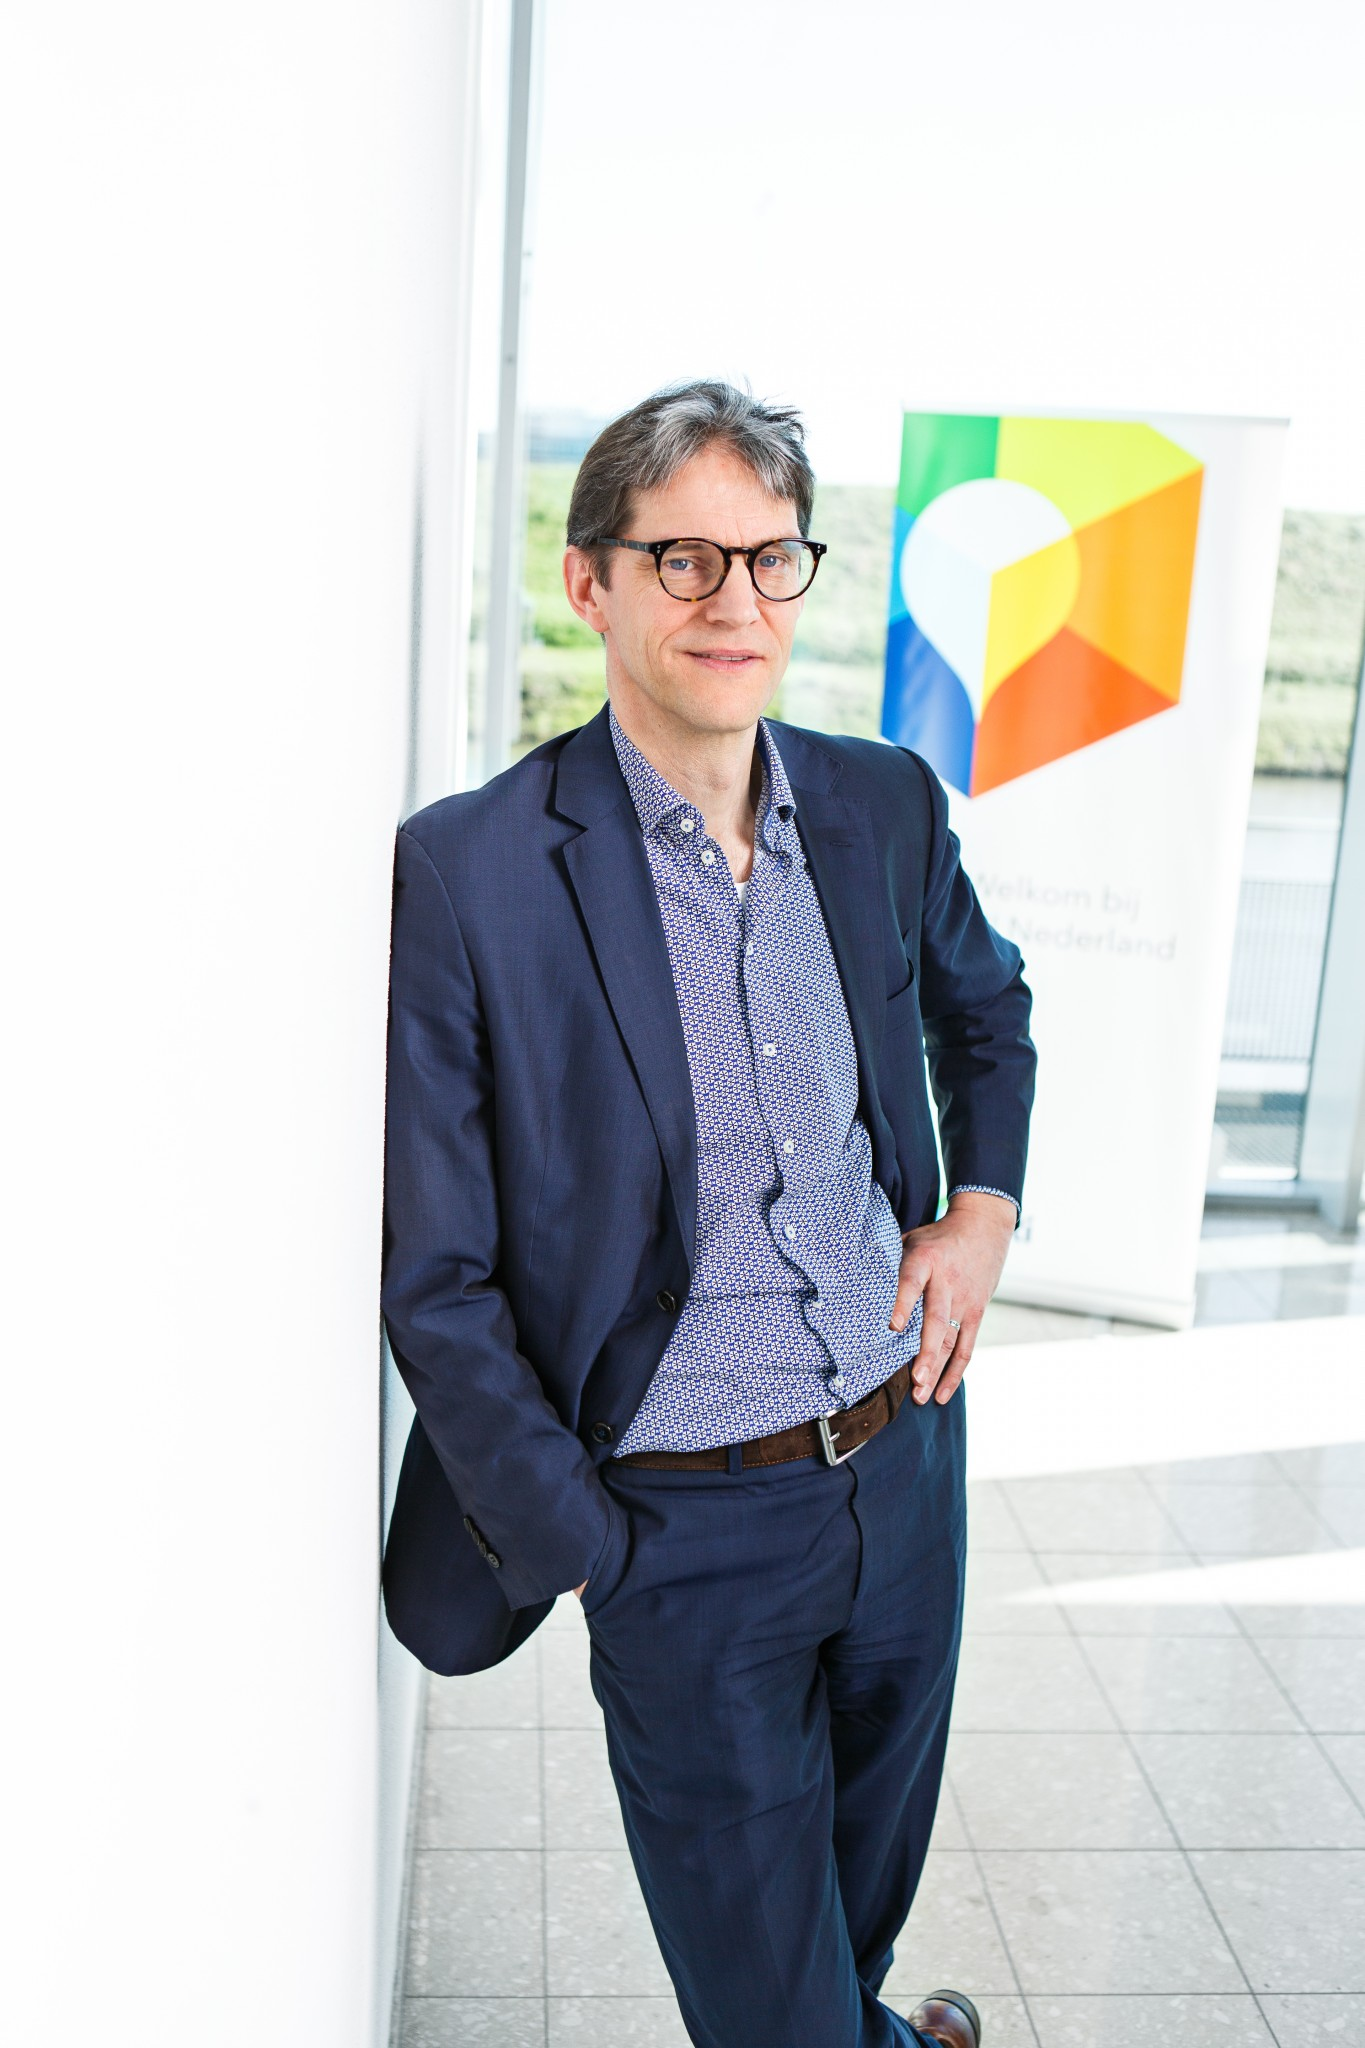 Paul Houtepen IRI zaltbommel commercieel directeur